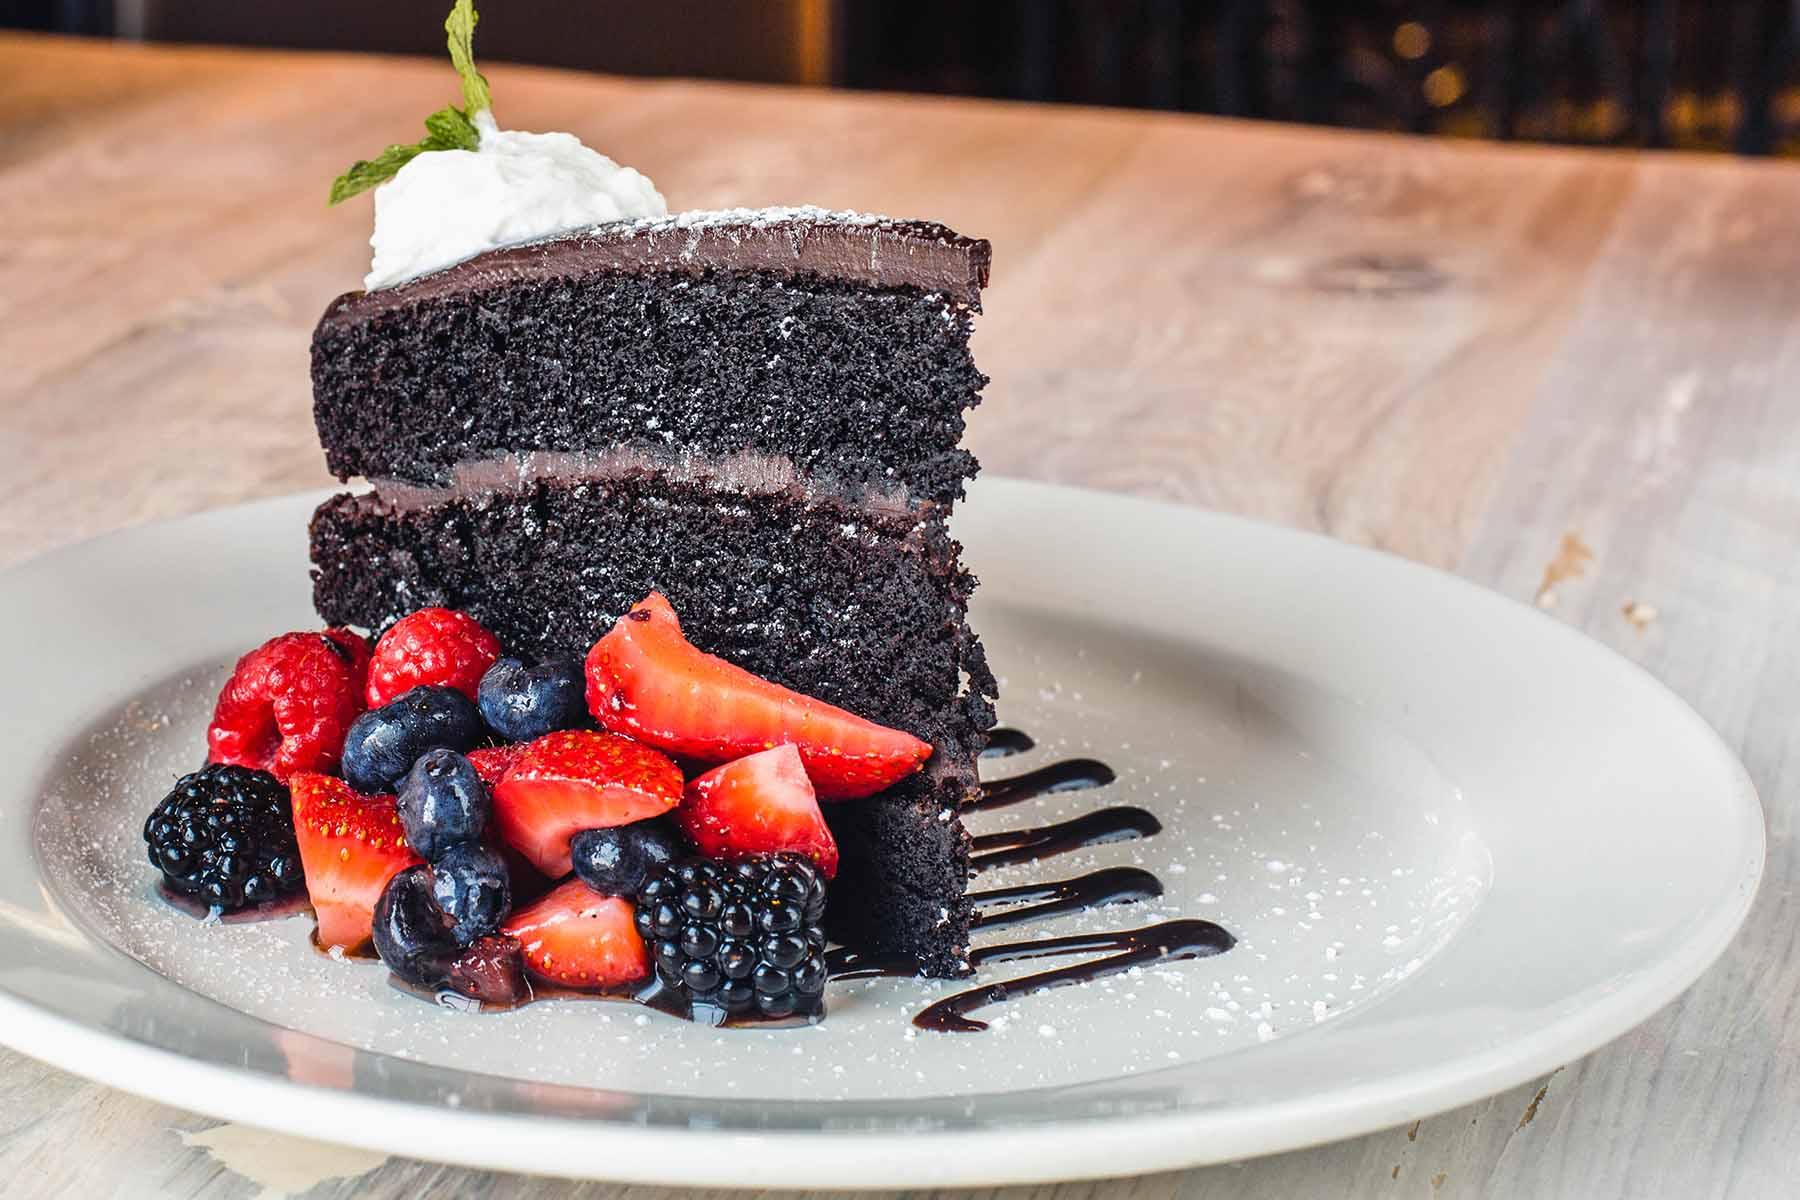 Mezzo chocolate cake